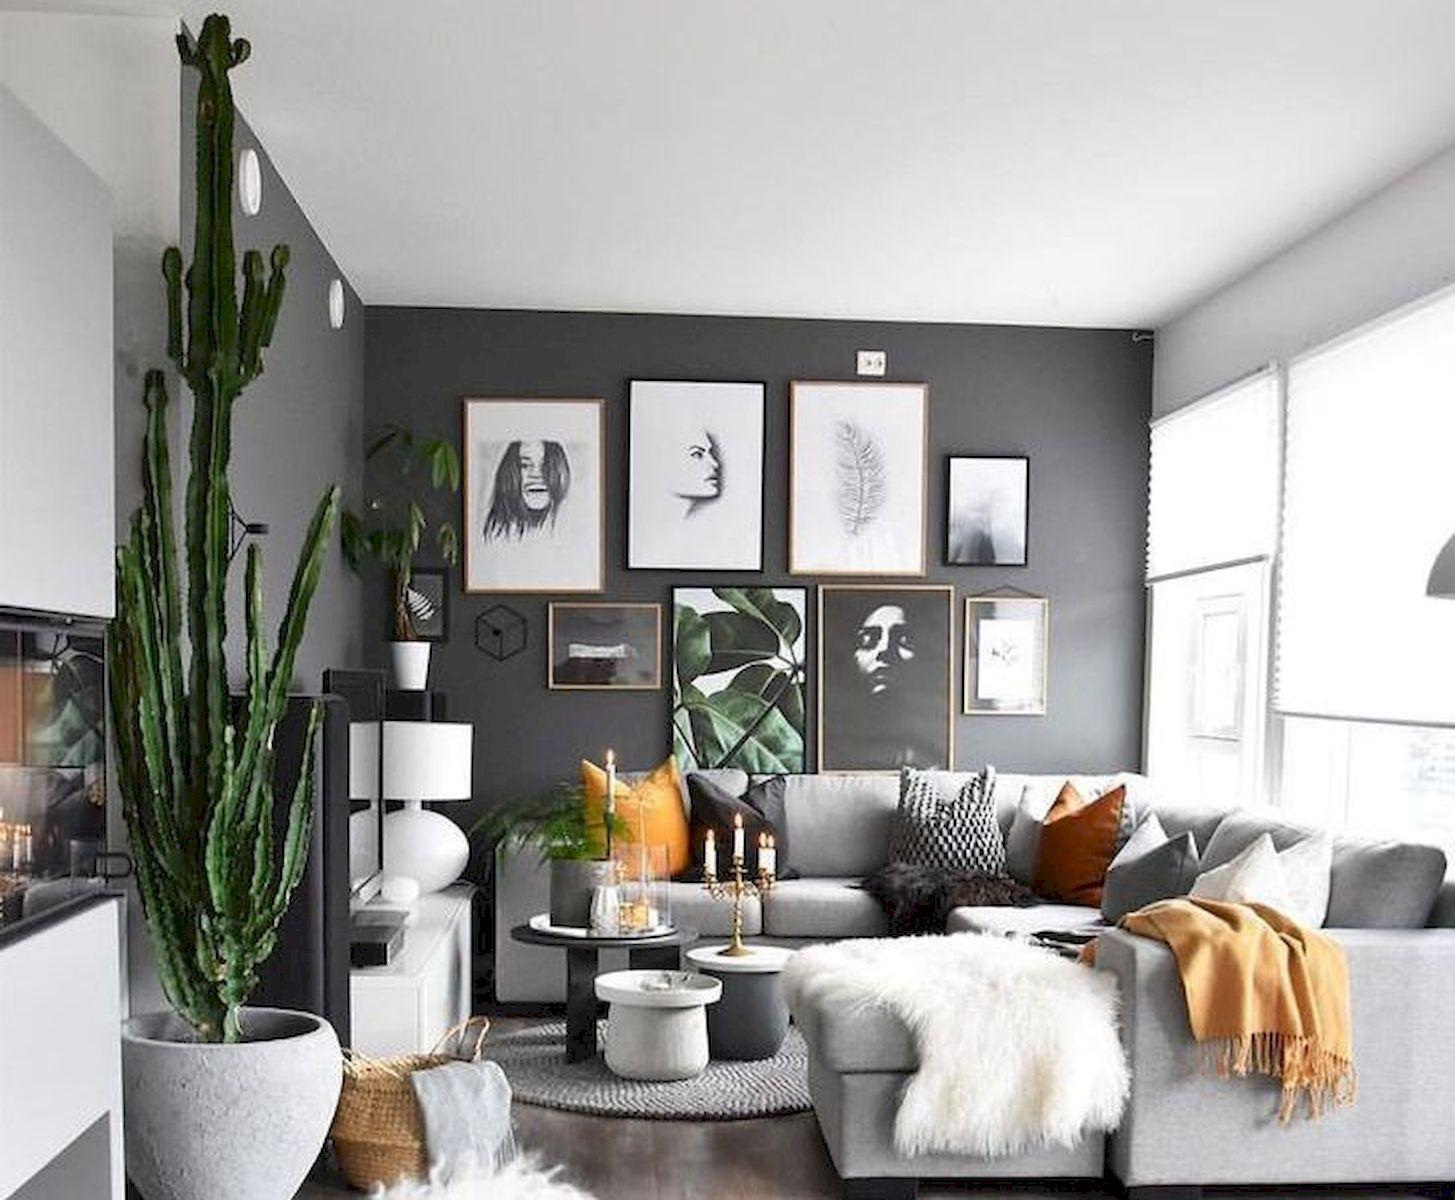 the best cactus decor ideas in 2019  home design  small